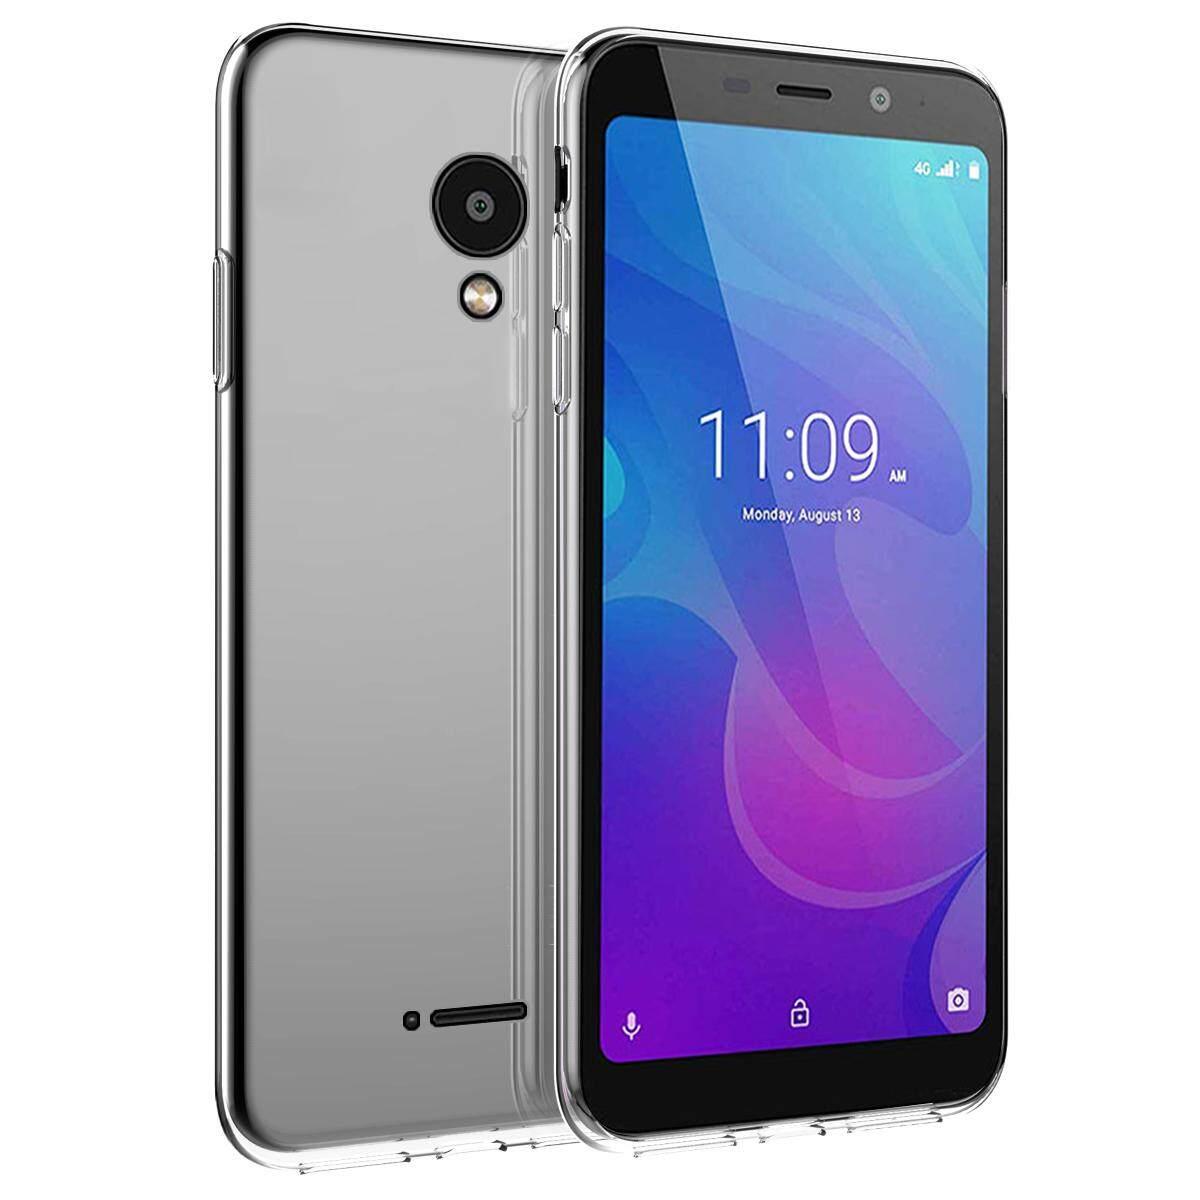 For Meizu C9 Case Meizu C9 Back Case Transparent Soft TPU Dropproof Shockproof Phone Back Case